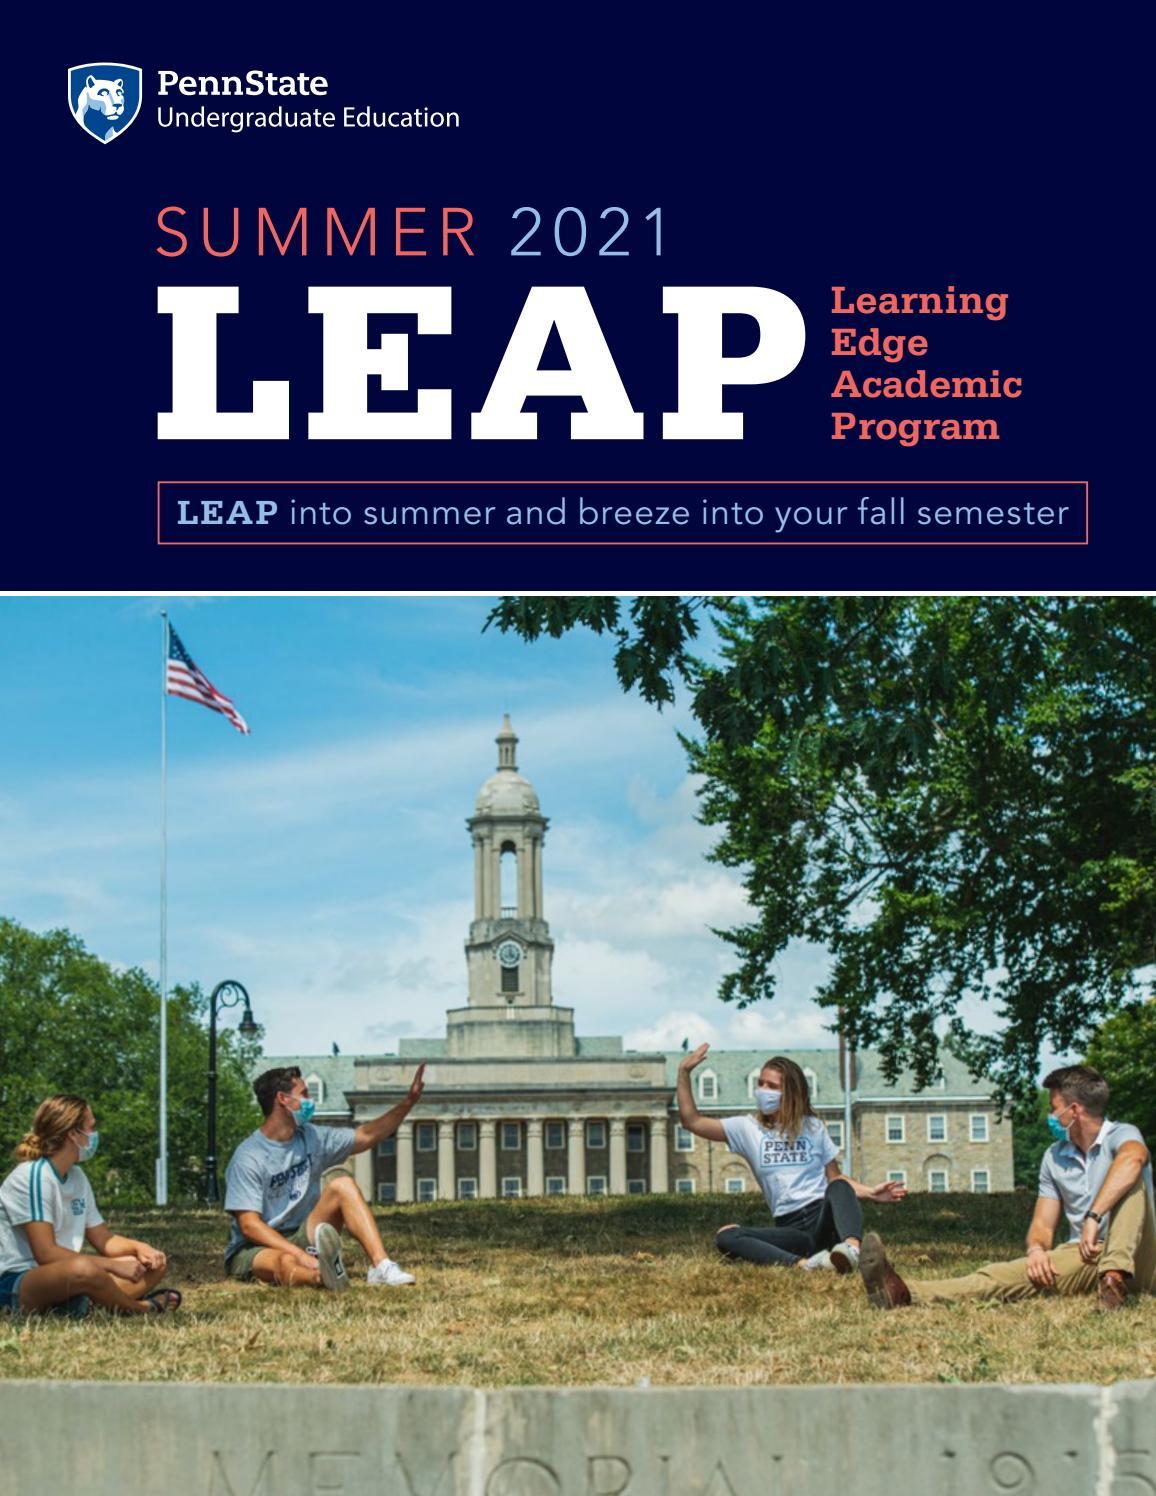 Psu Academic Calendar 2022.Learning Edge Academic Program Leap By Penn State Undergraduate Admissions Issuu